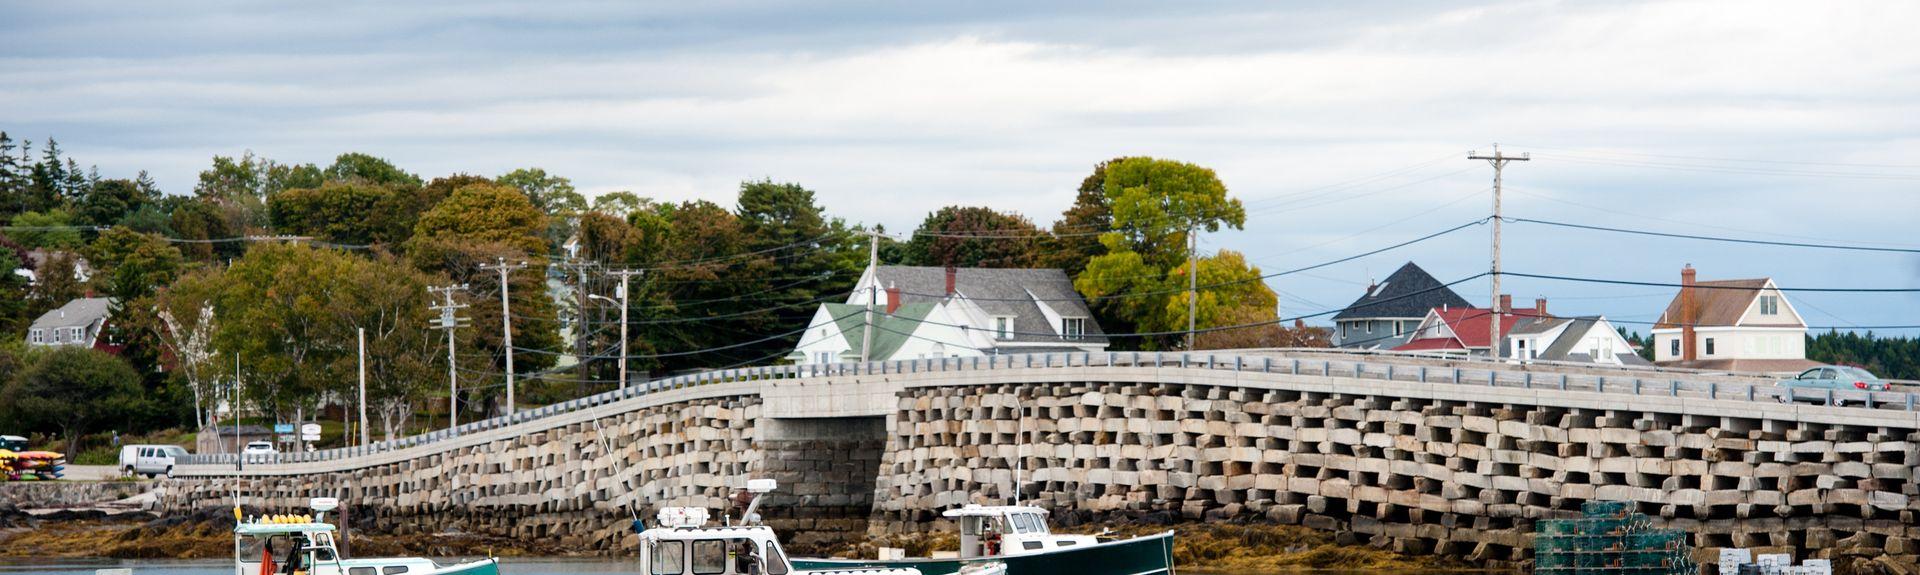 Orr's Island, Harpswell, Maine, United States